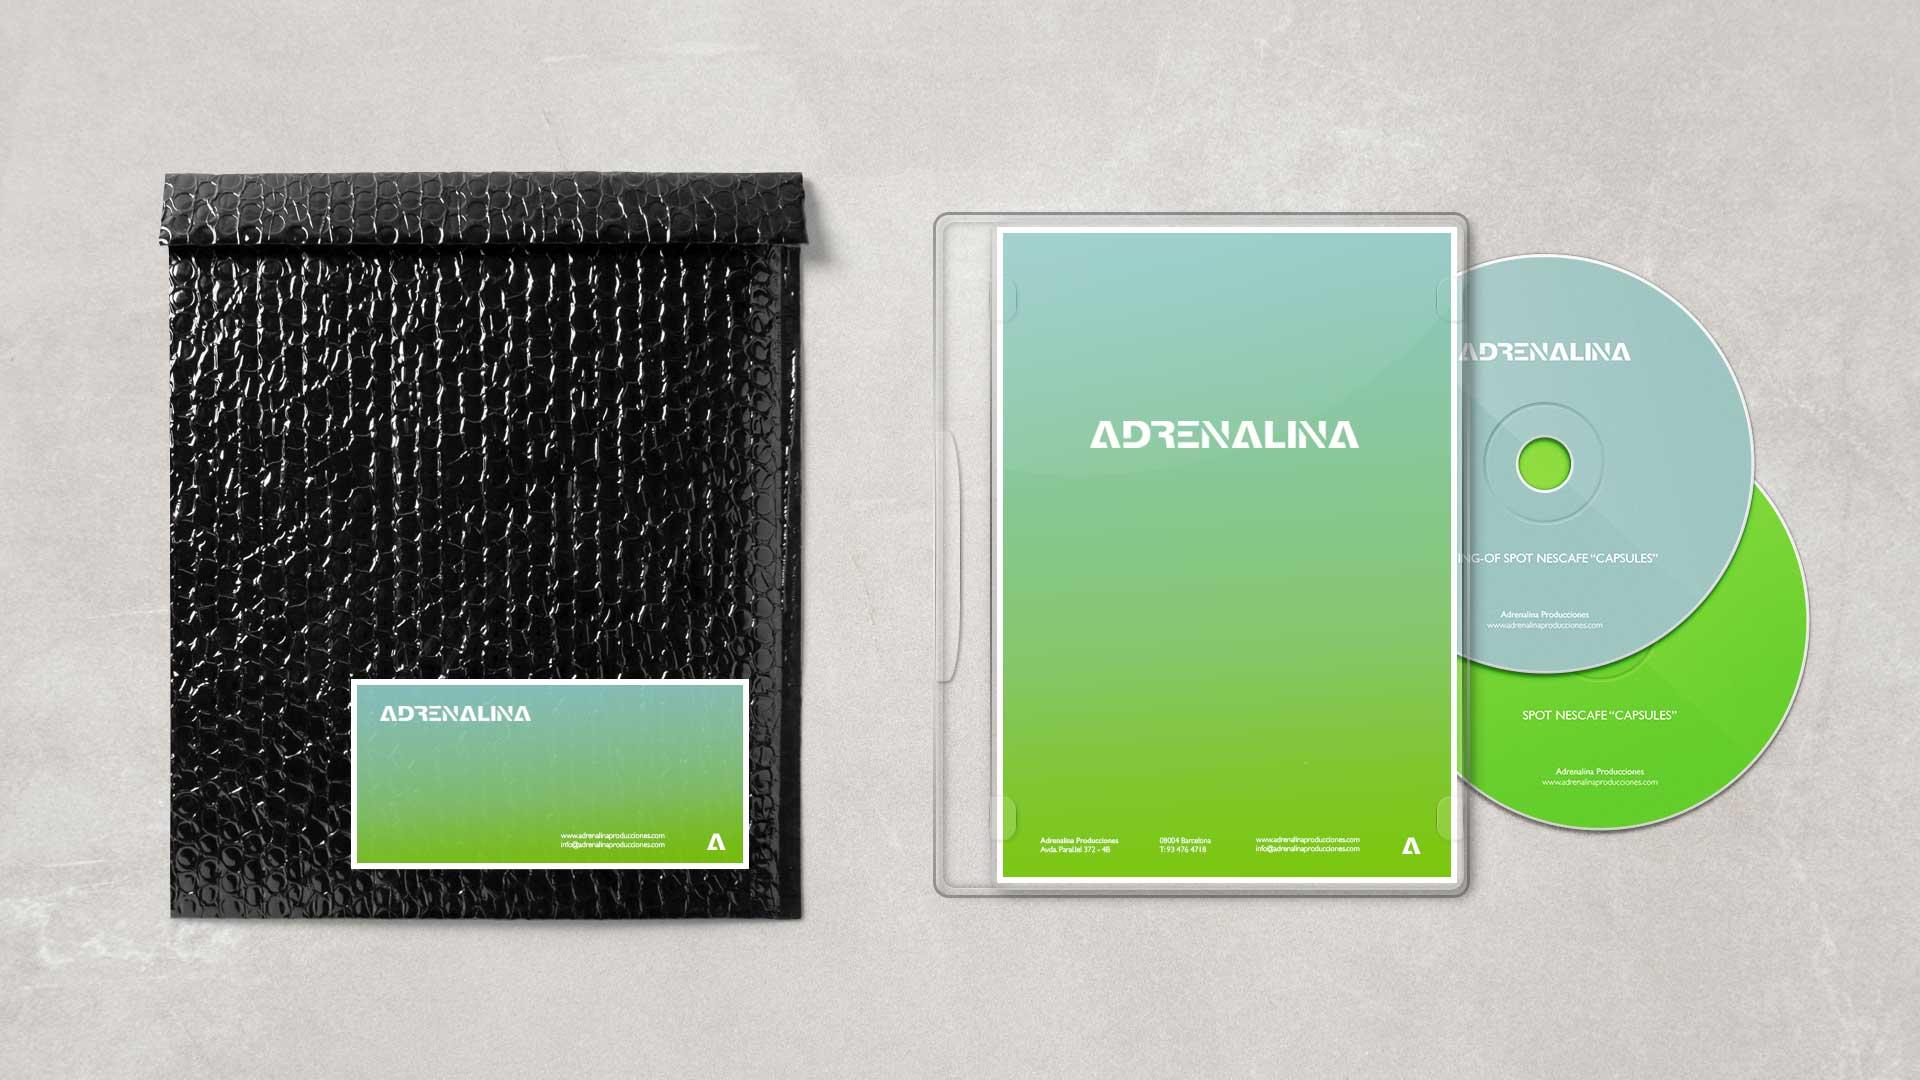 adrenalina_branding_identity_9